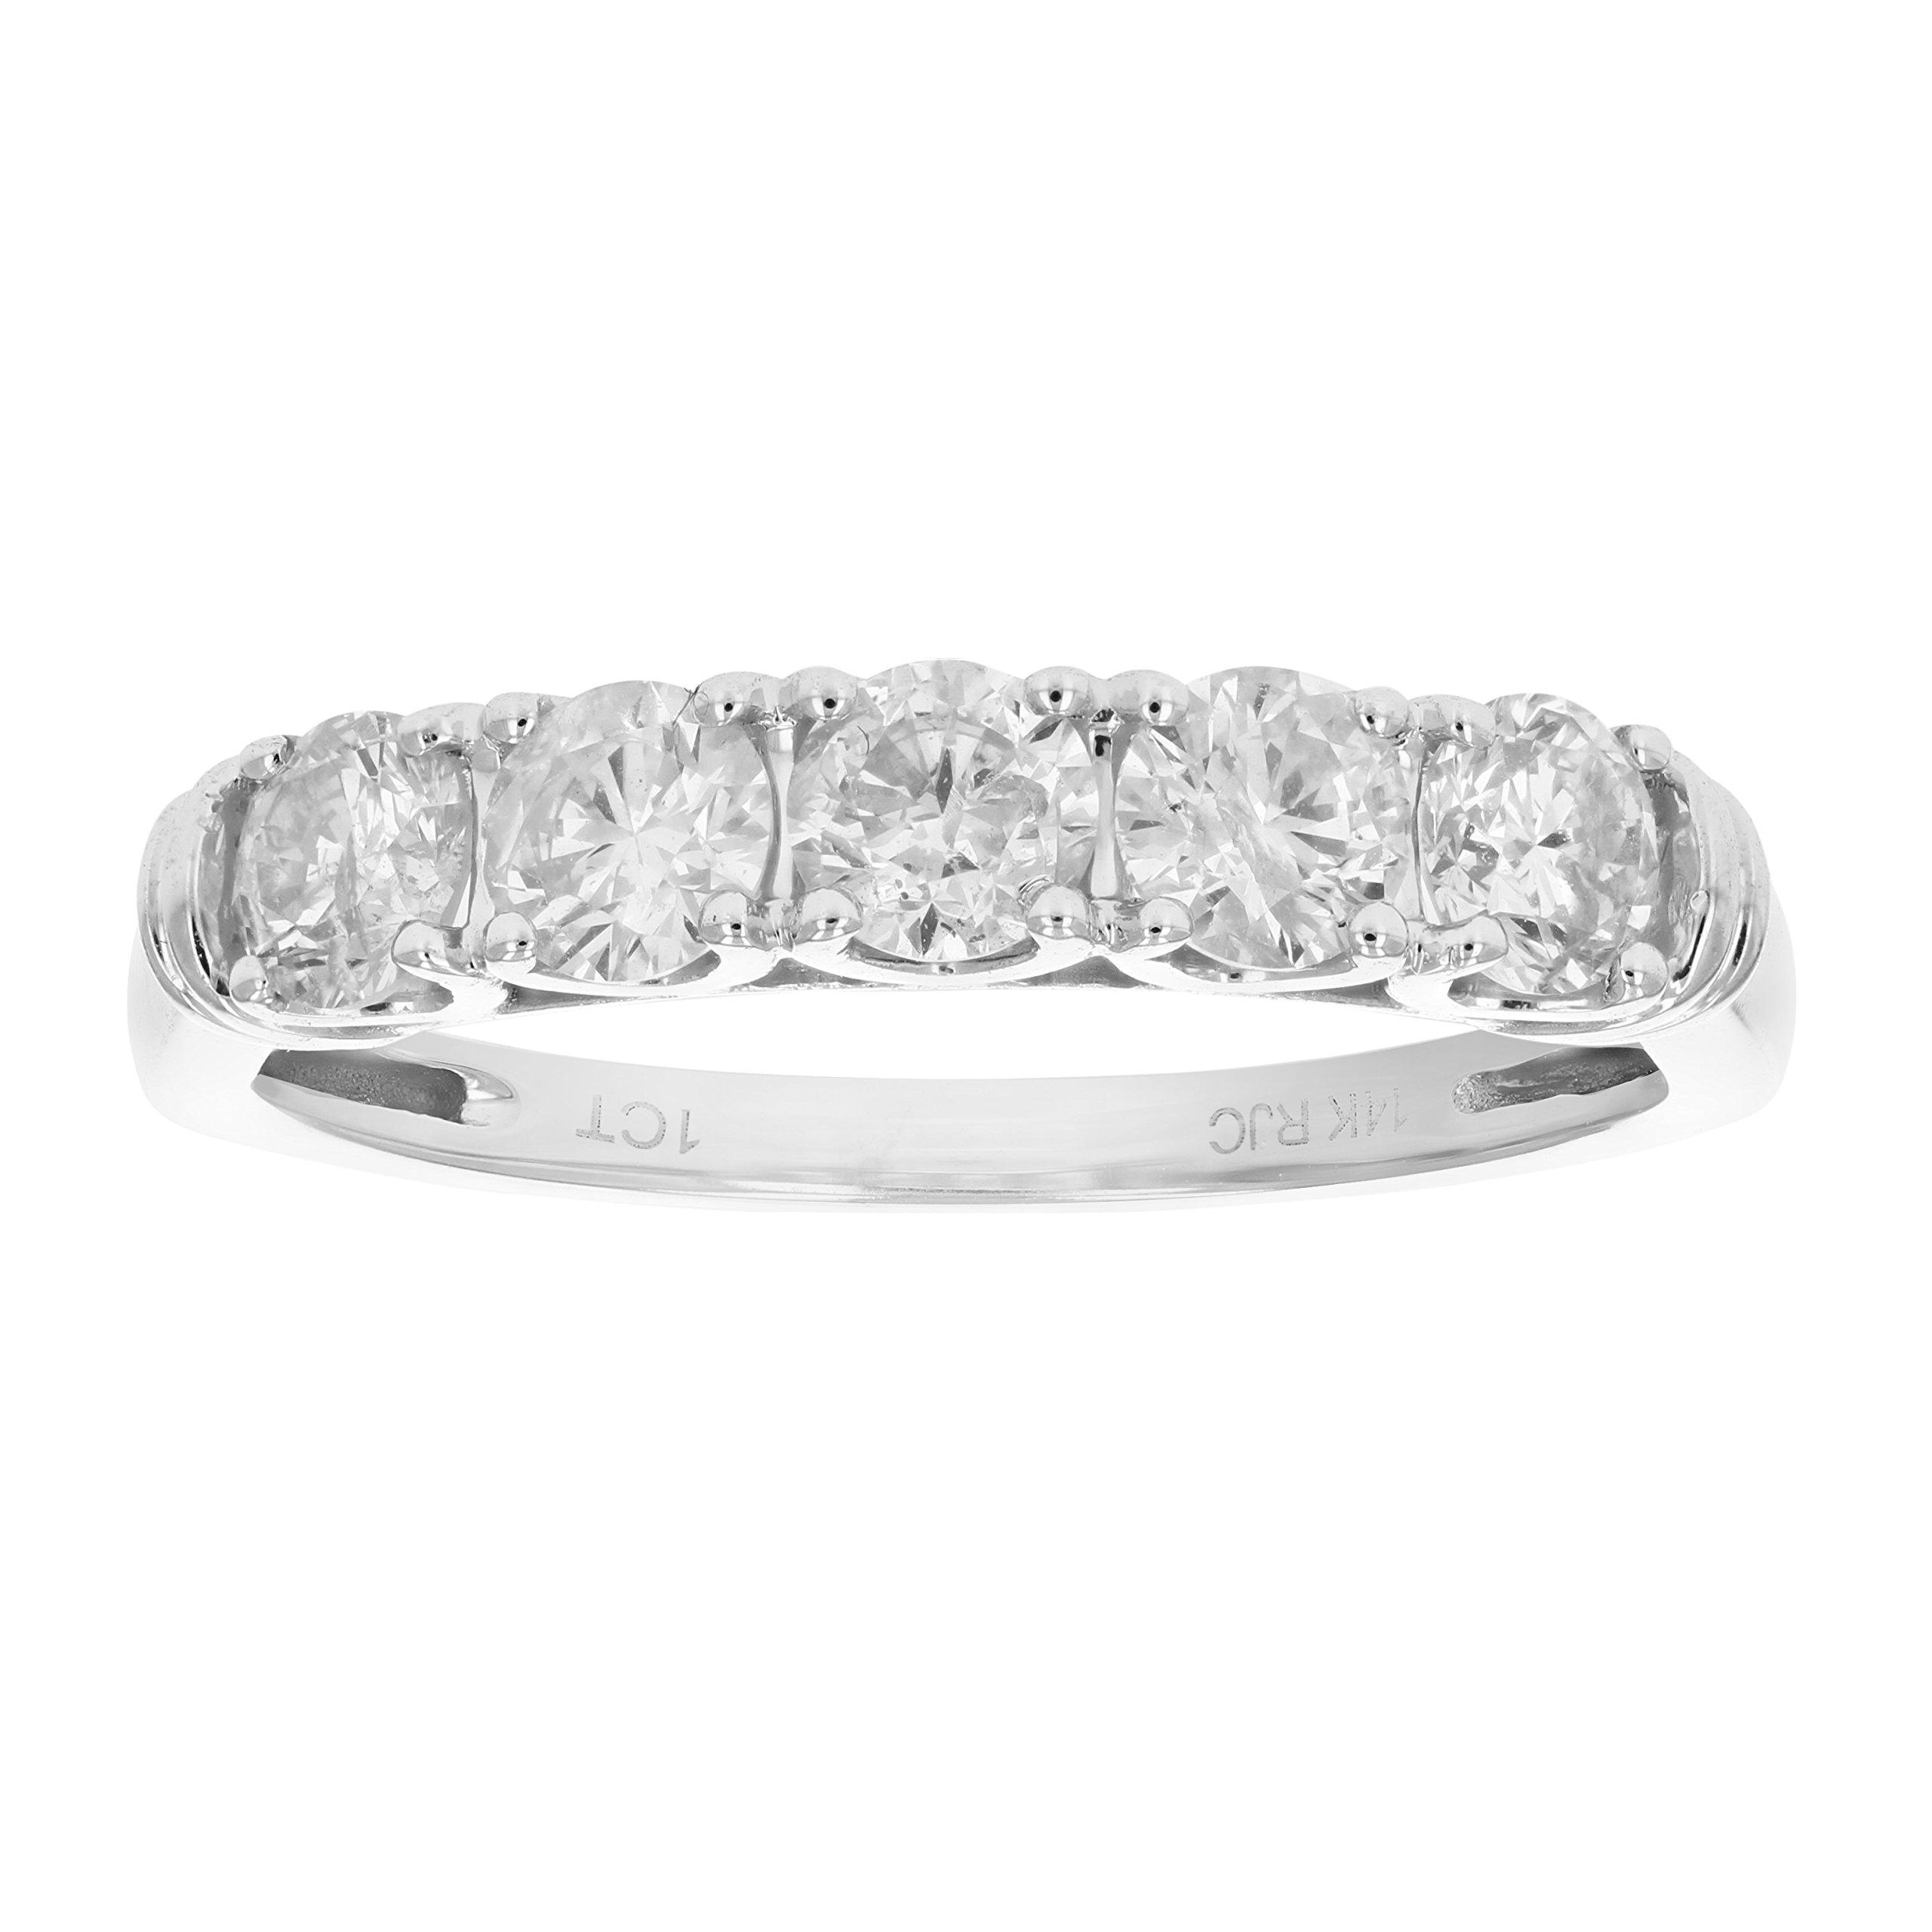 1 CT 5 Stone Diamond Ring 14K White Gold in Size 7